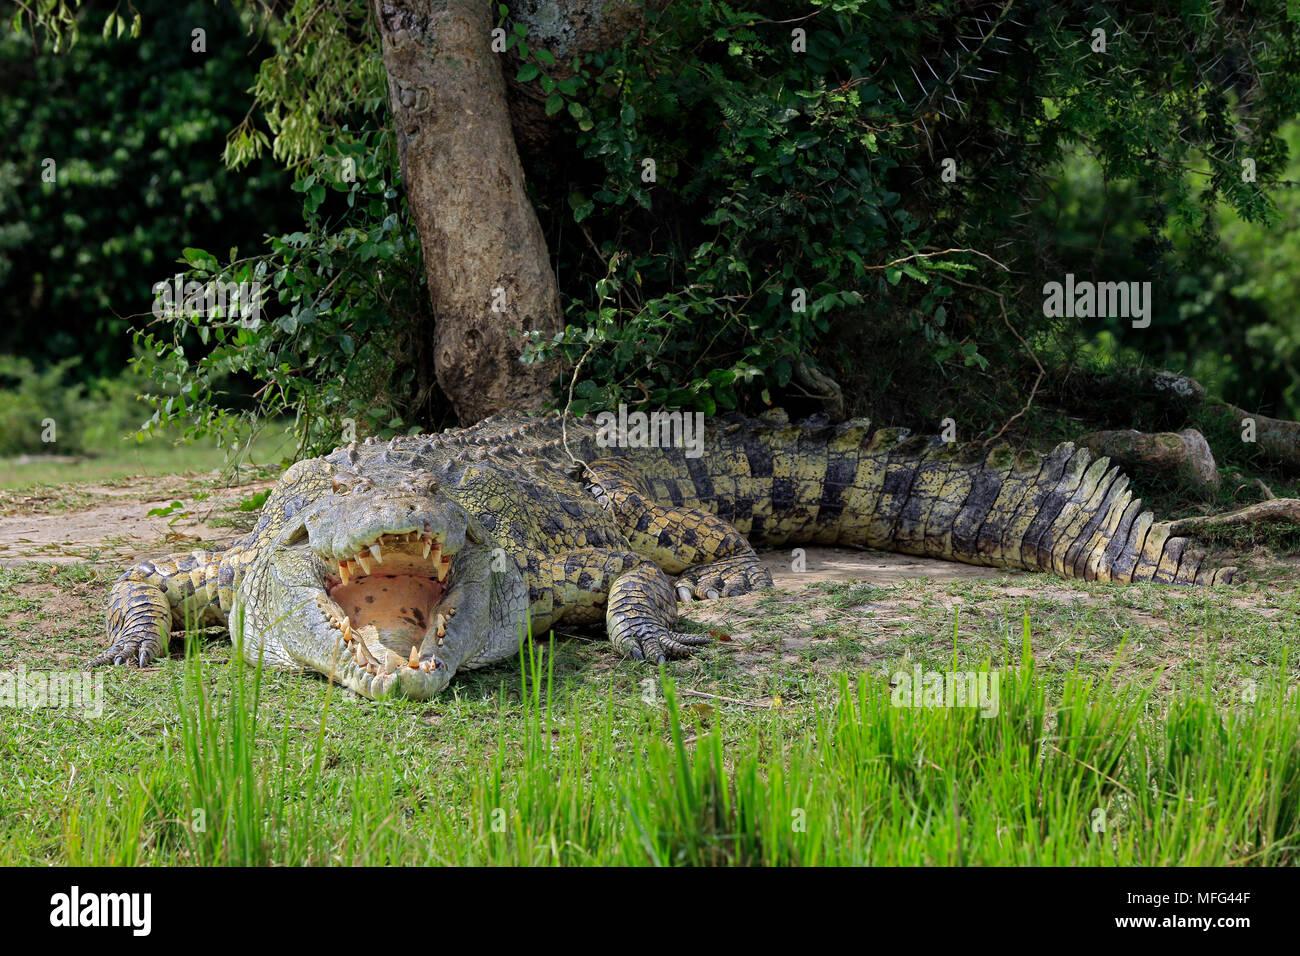 Nile Crocodile (Crocodylus Niloticus) with Open Mouth, Lying on the River Bank. Murchison Falls, Uganda - Stock Image